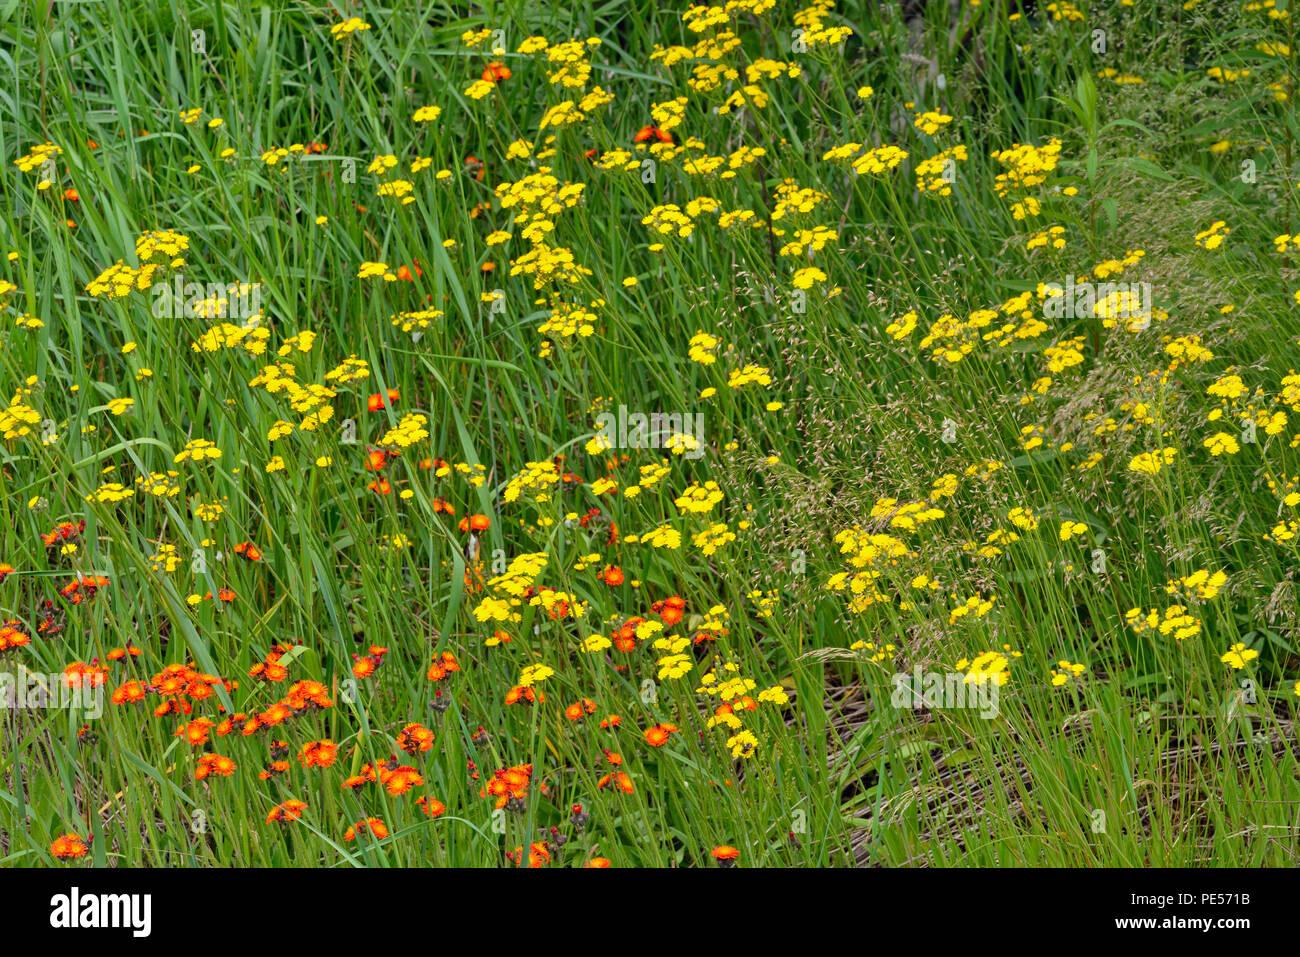 Roadside wildflowers featuring yellow hawkweed, Greater Sudbury, Ontario, Canada - Stock Image